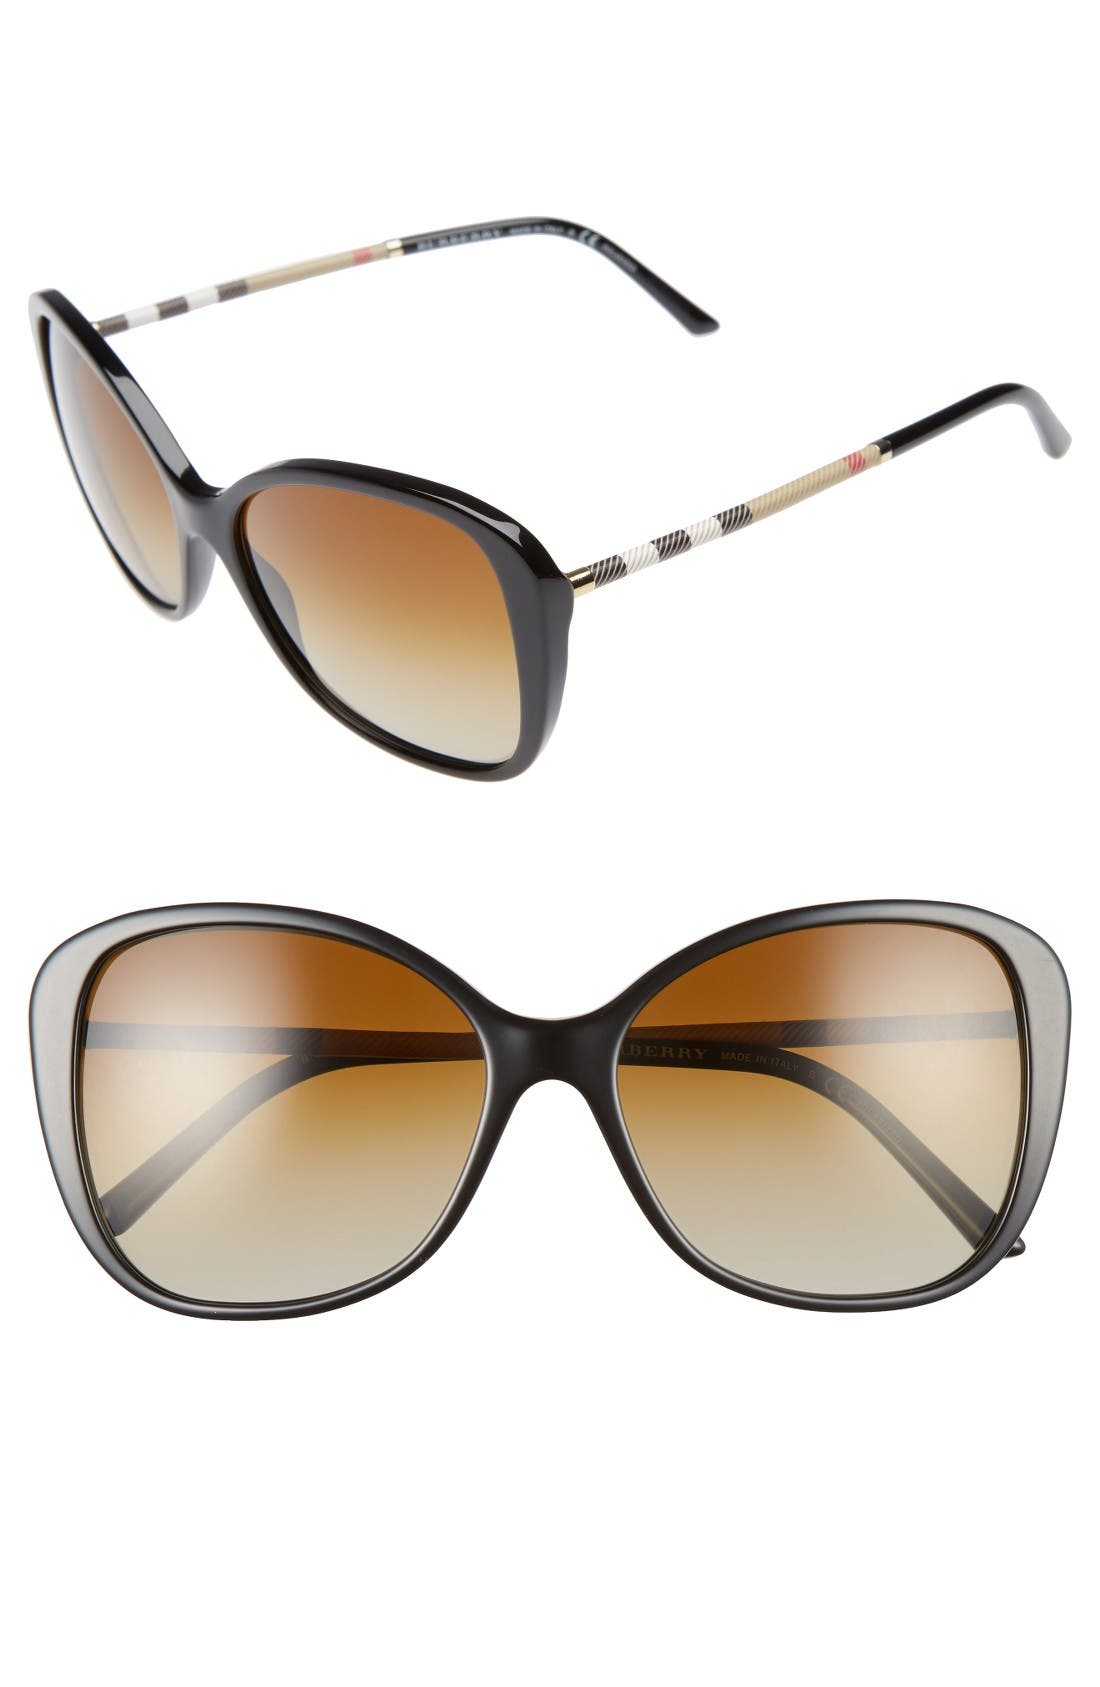 Burberry 57mm Polarized Sunglasses